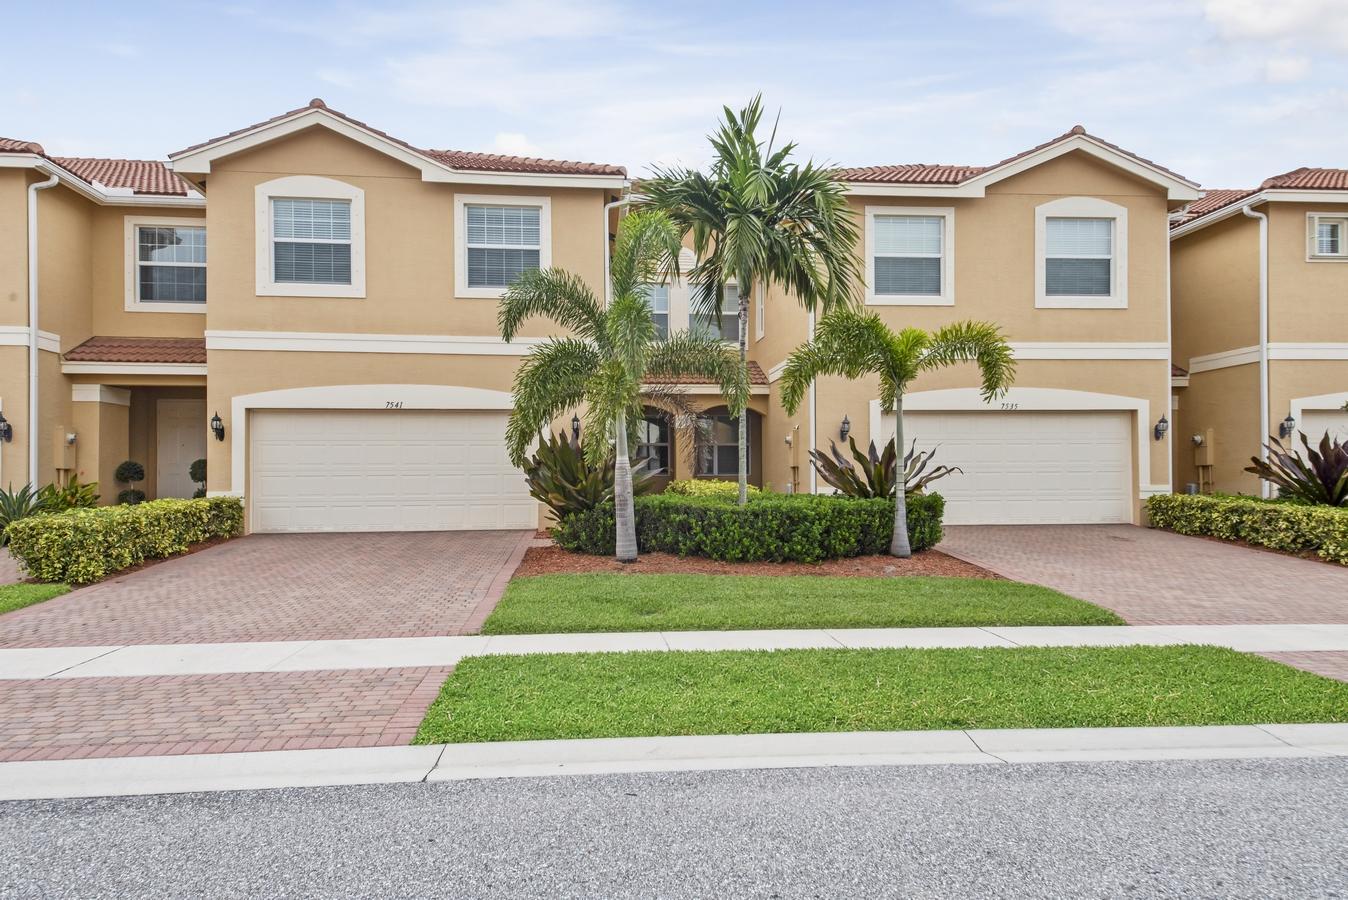 7541 Spatterdock Drive Boynton Beach, FL 33437